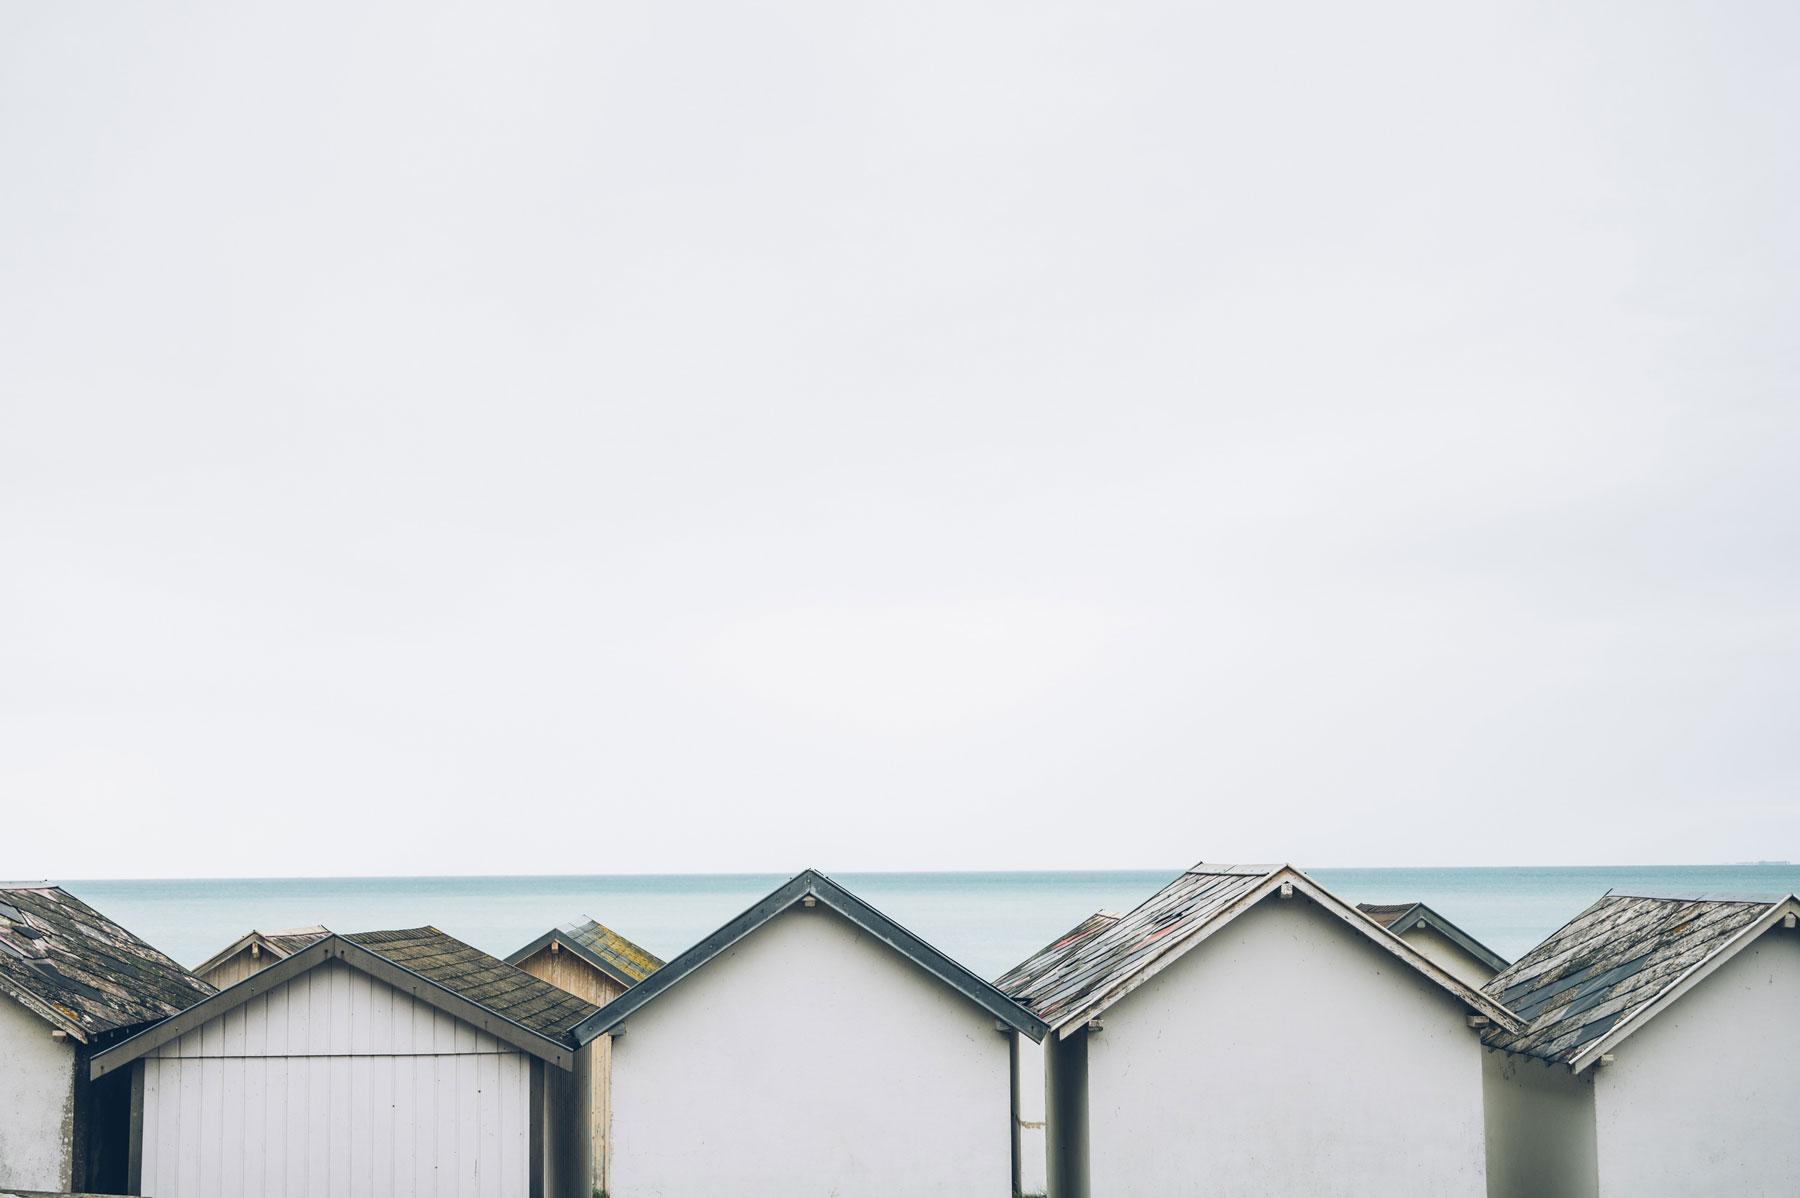 Cabines de Carolles, La Manche